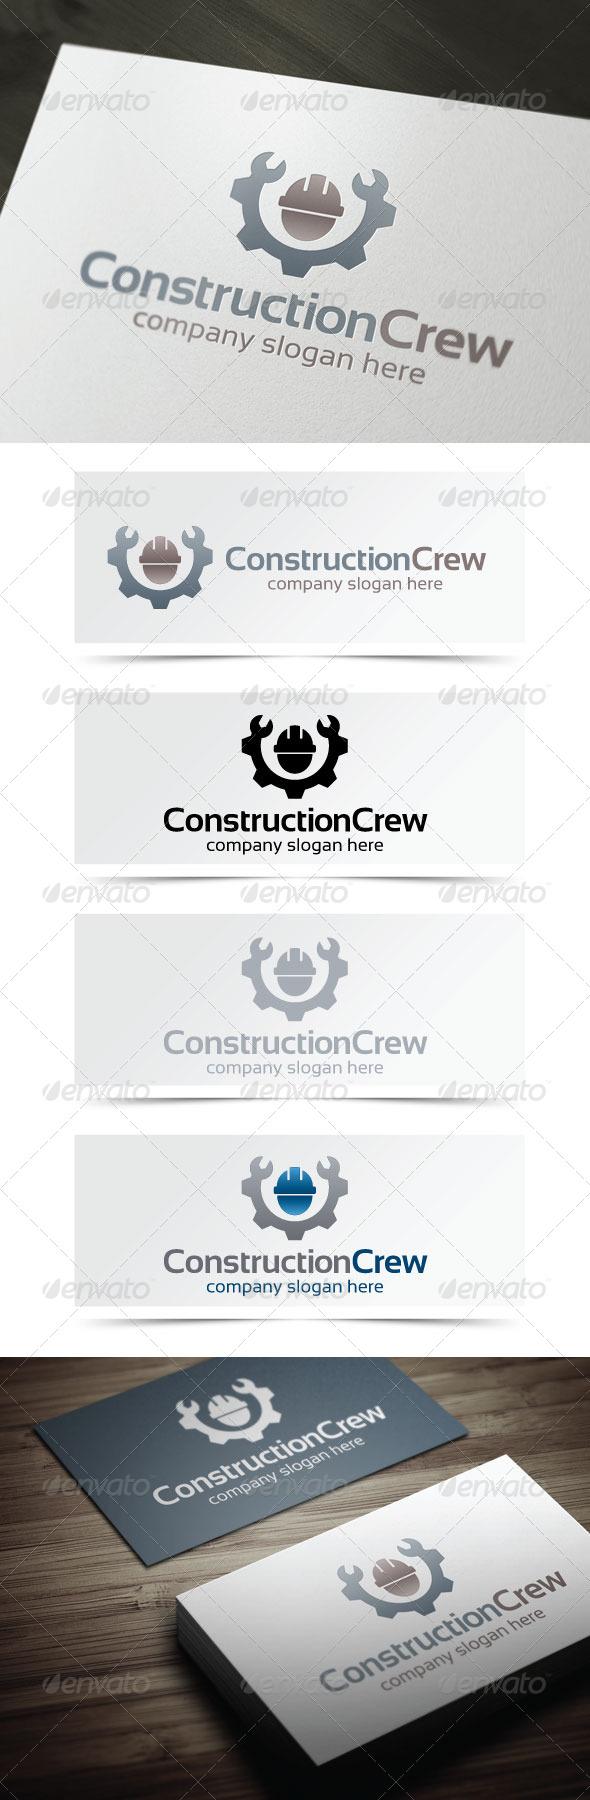 GraphicRiver Construction Crew 4623536